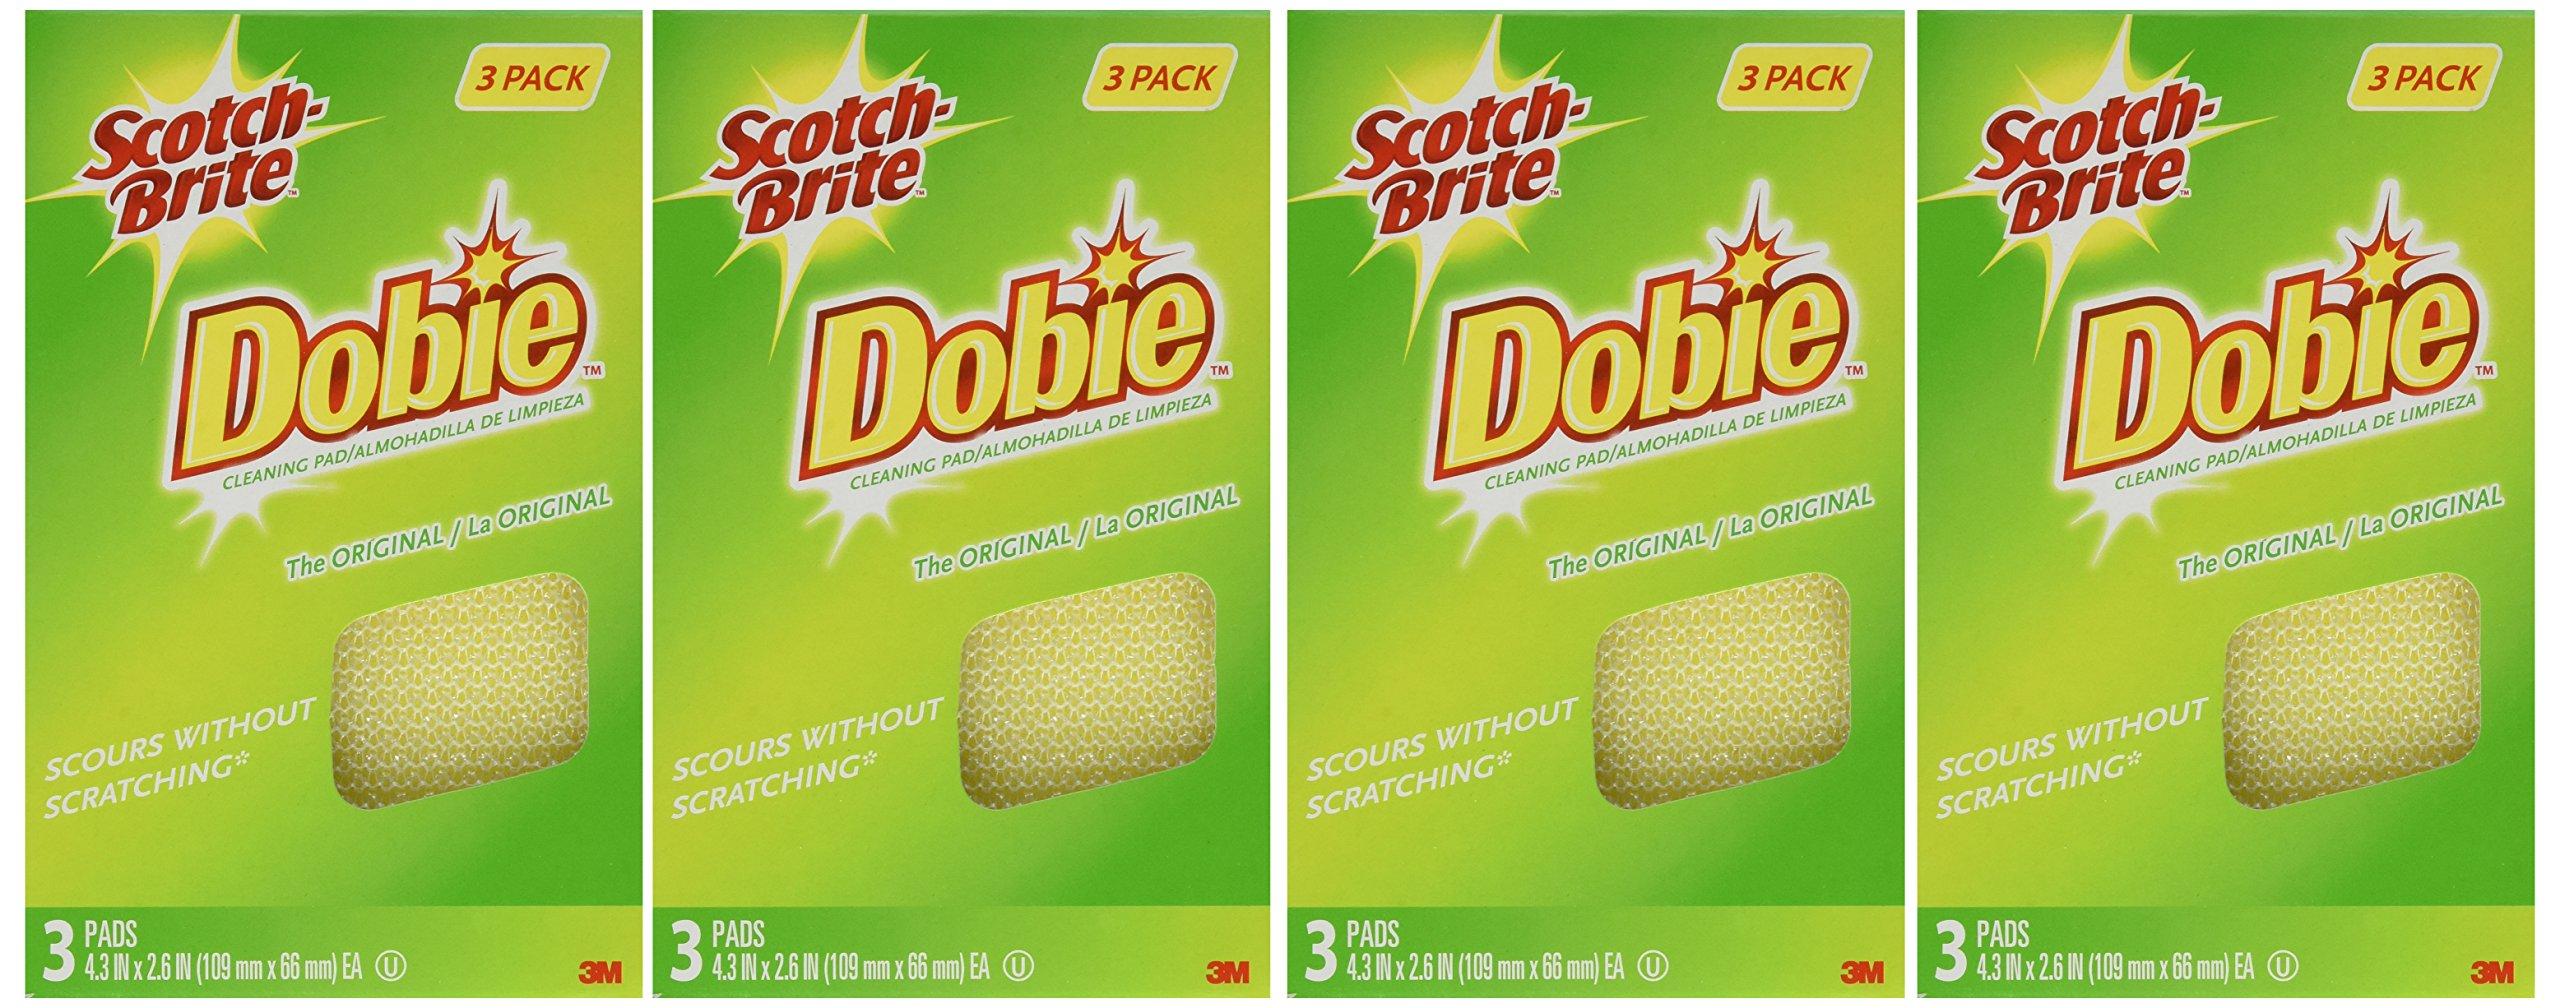 Scotch-Brite Dobie All Purpose Pads, 3-Count (Pack of 4) Total 12 Pads